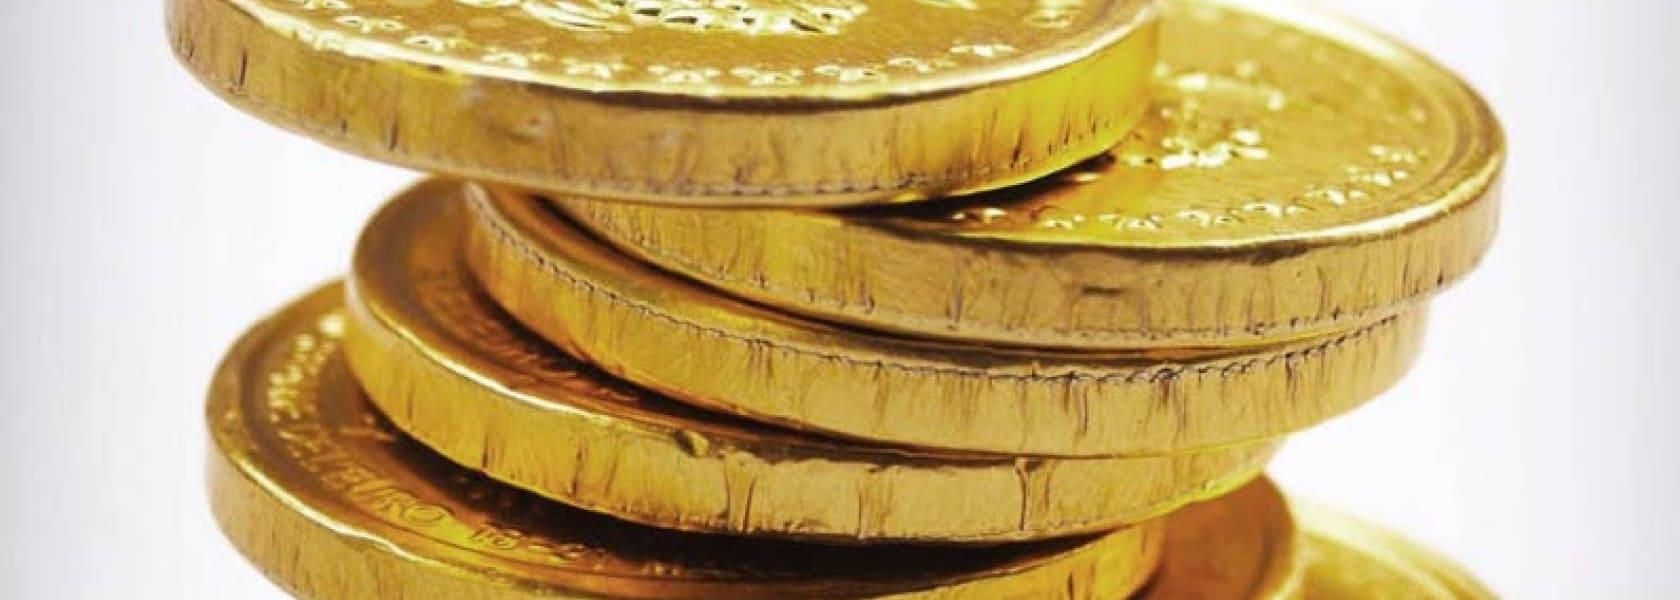 Precious Metals Tokenization & Proof of Origin image